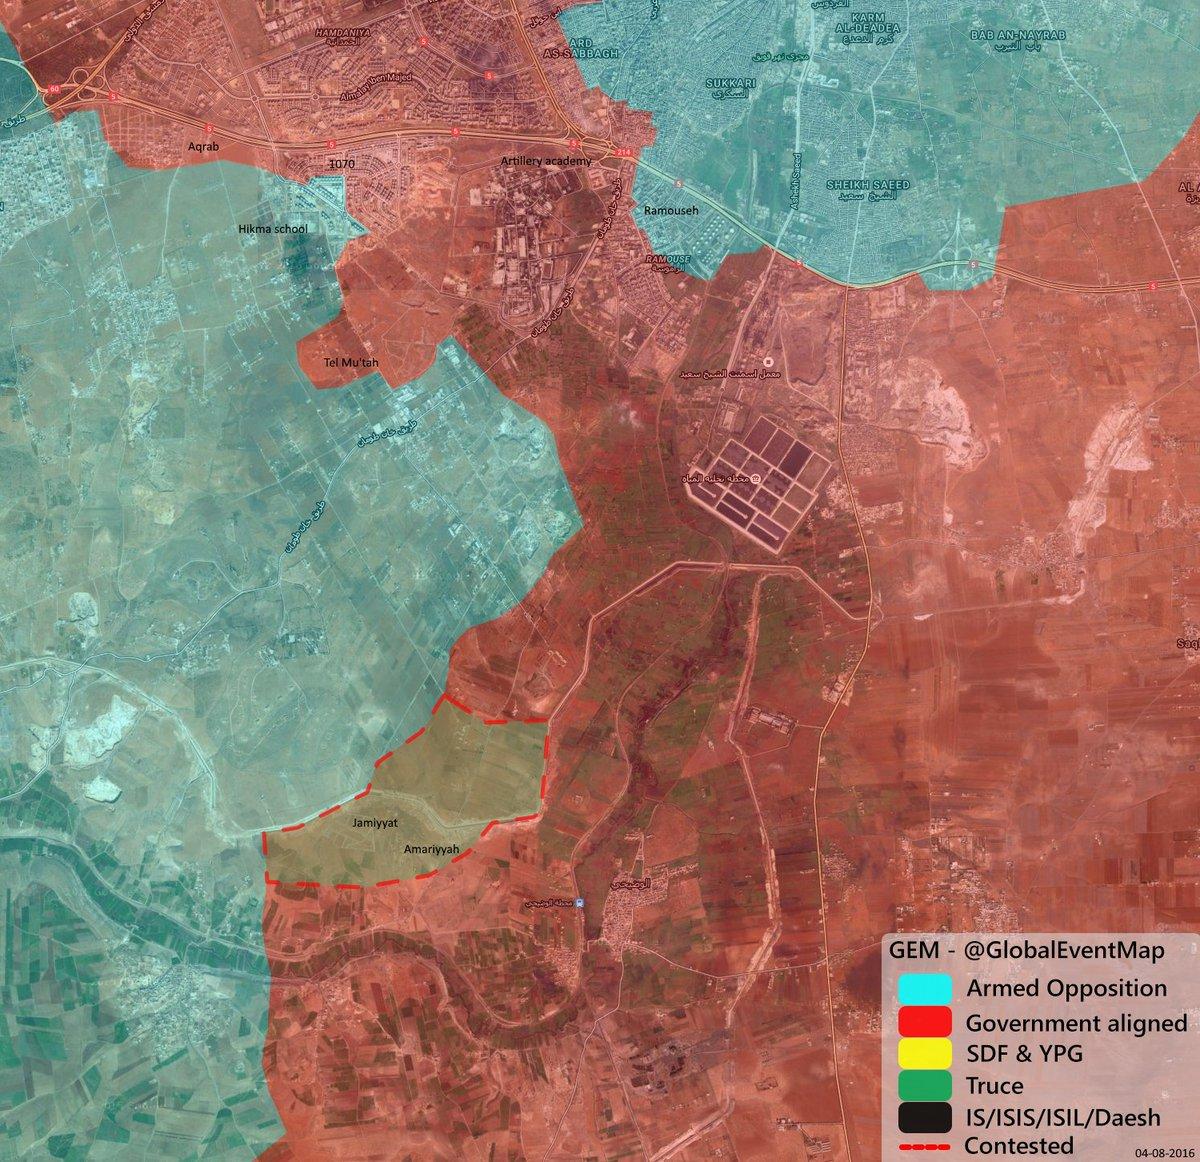 Jihadists Claim Capture of Jamiyat and Amiriyah in Southwestern Aleppo